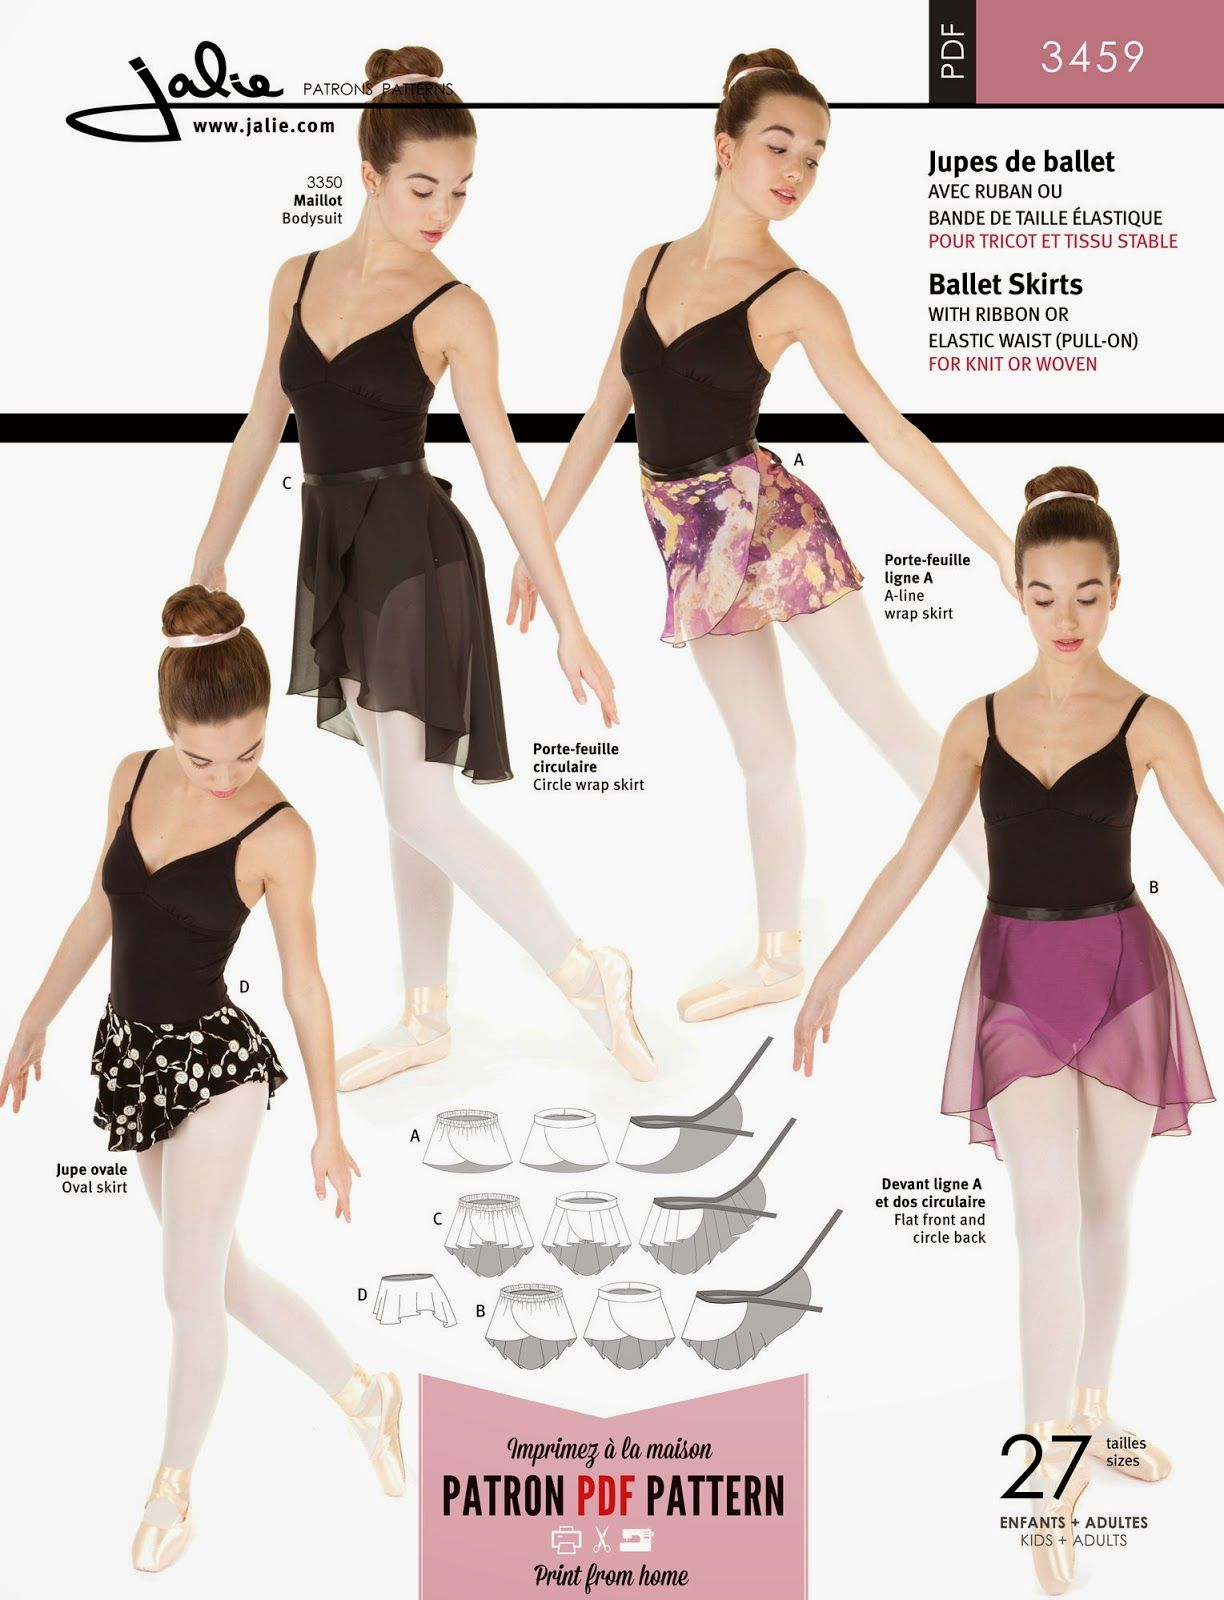 3359.jpg (1224×1600) | Ballet/Dance Costumes/Makeup by P Tern ...